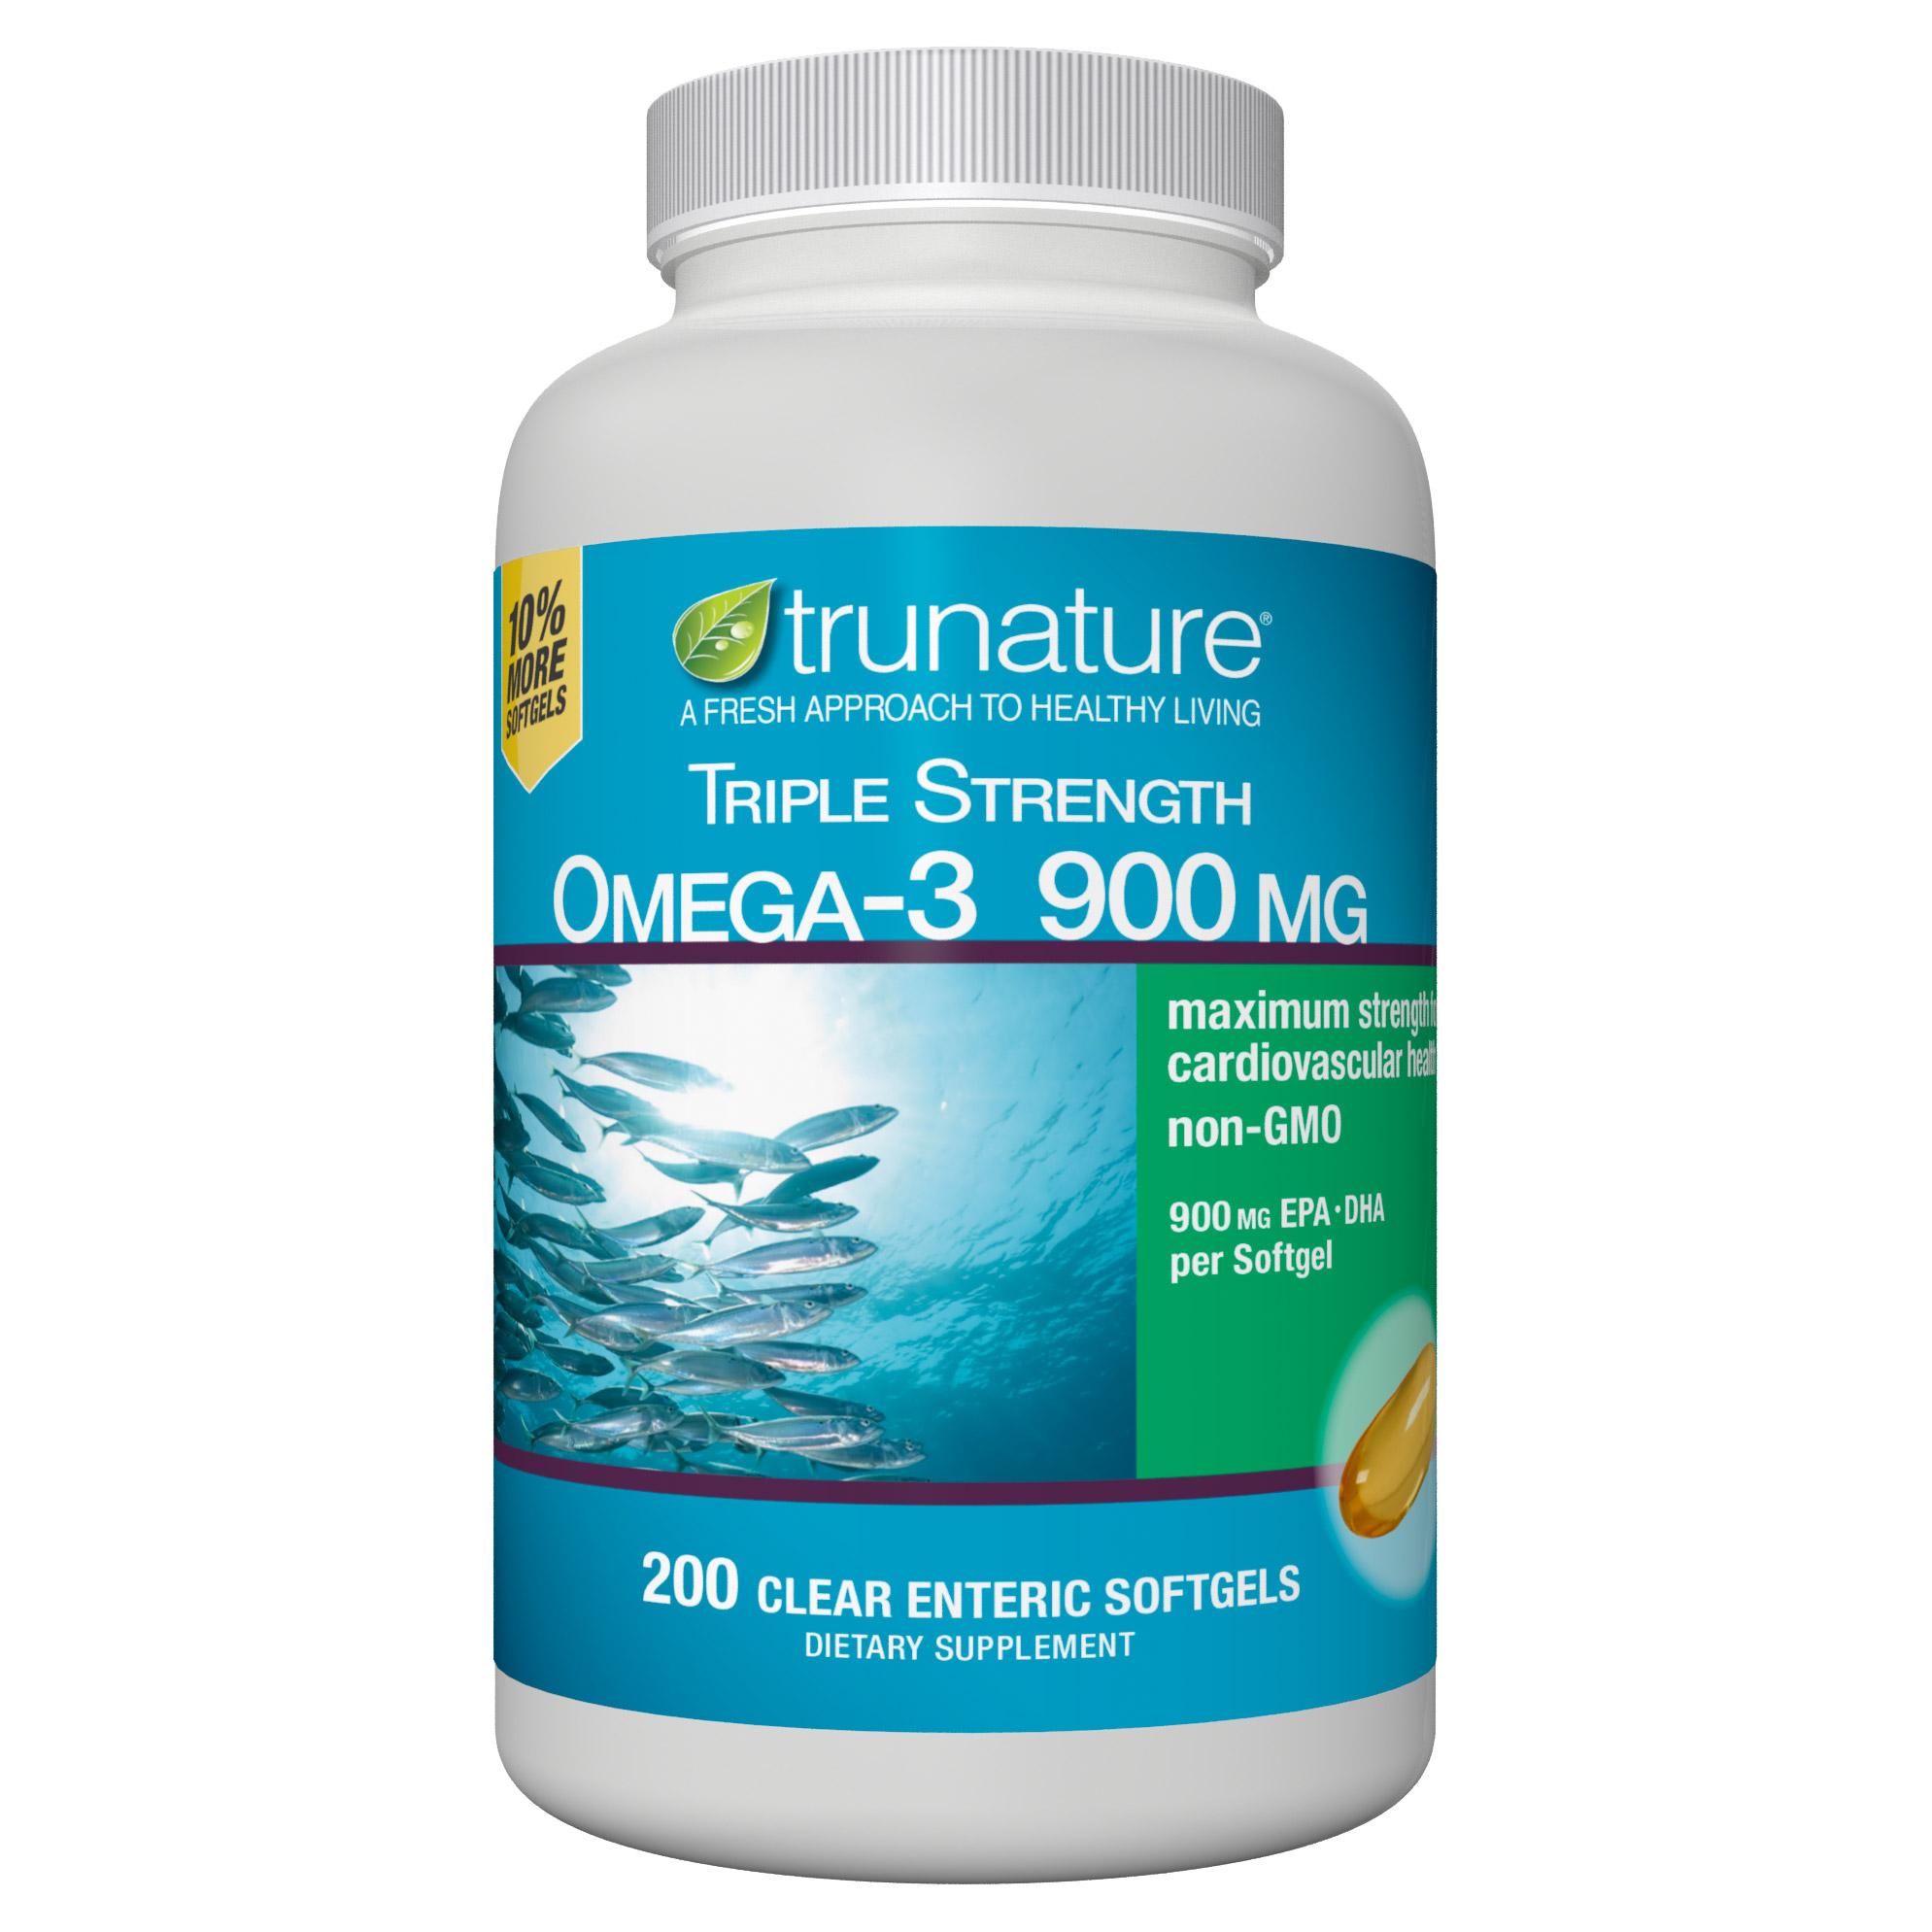 trunature Triple Strength Omega-3 900 mg., 200 Softgels